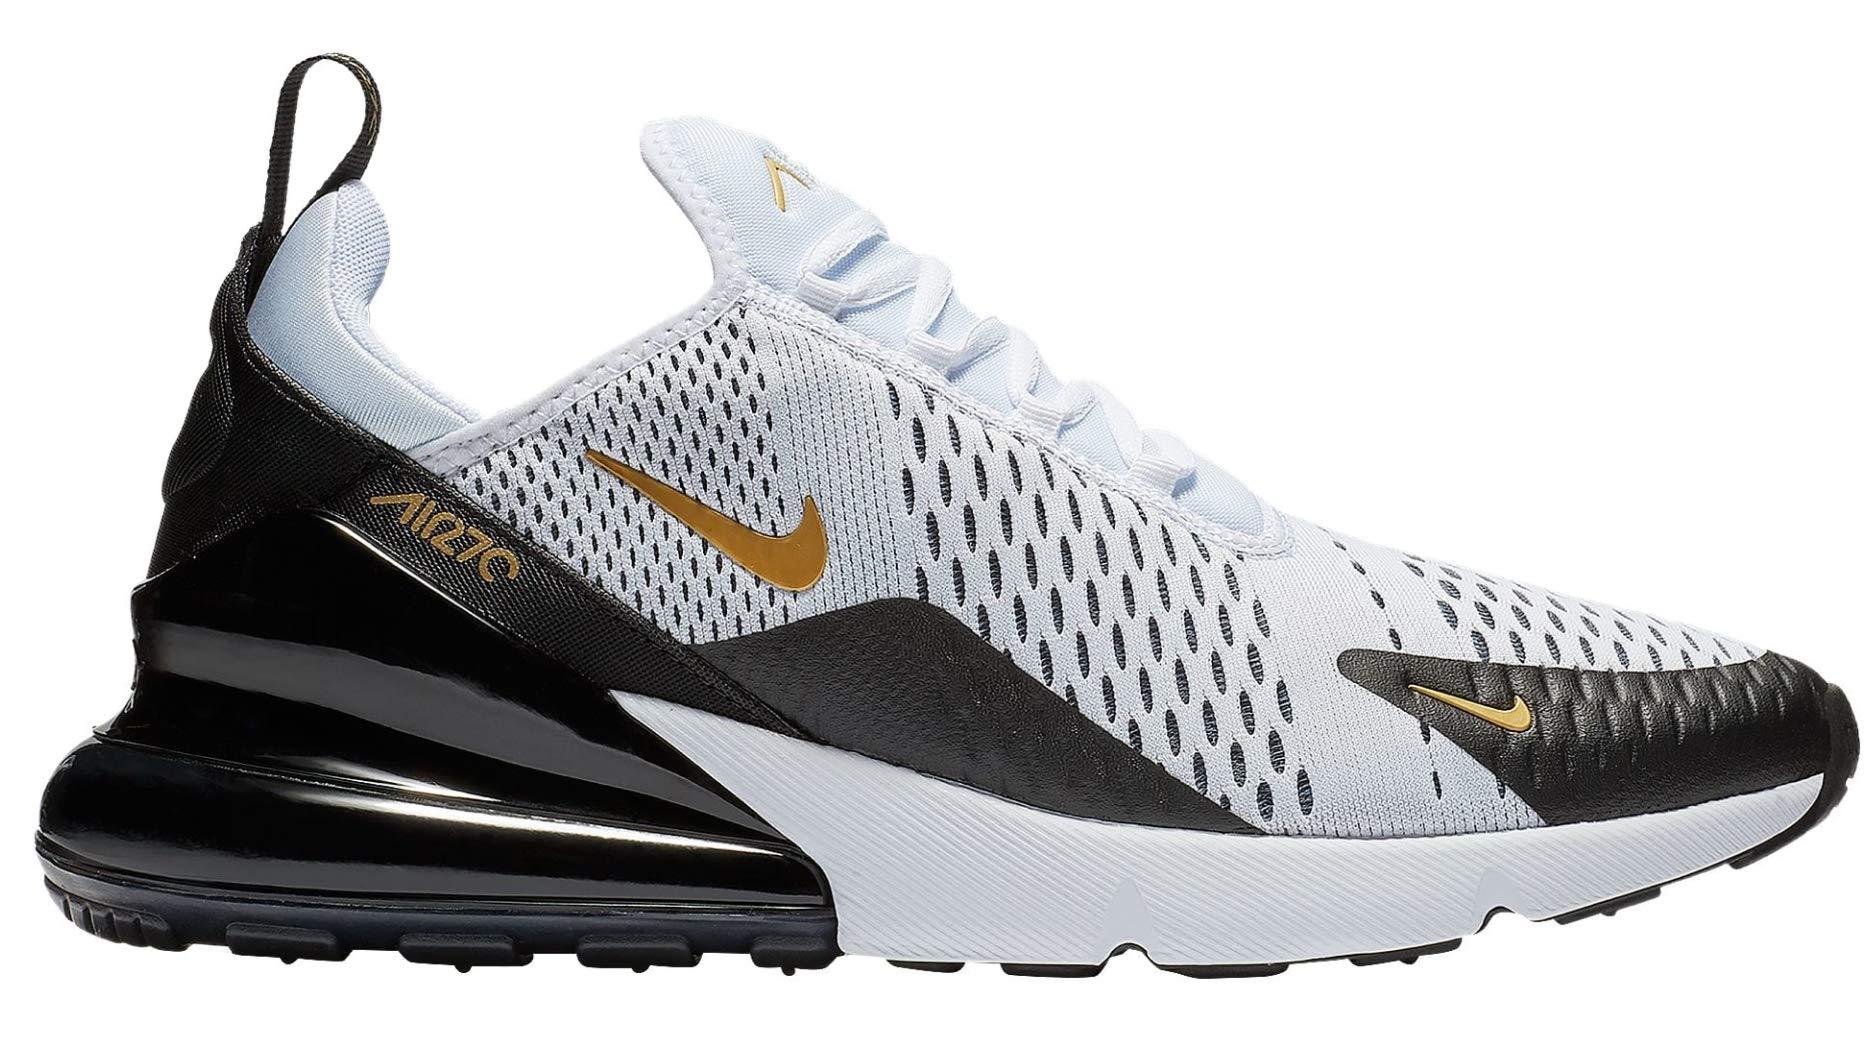 Nike Men's Air Max 270 WhiteBlackGold AV7892 100 (Size: 10.5)